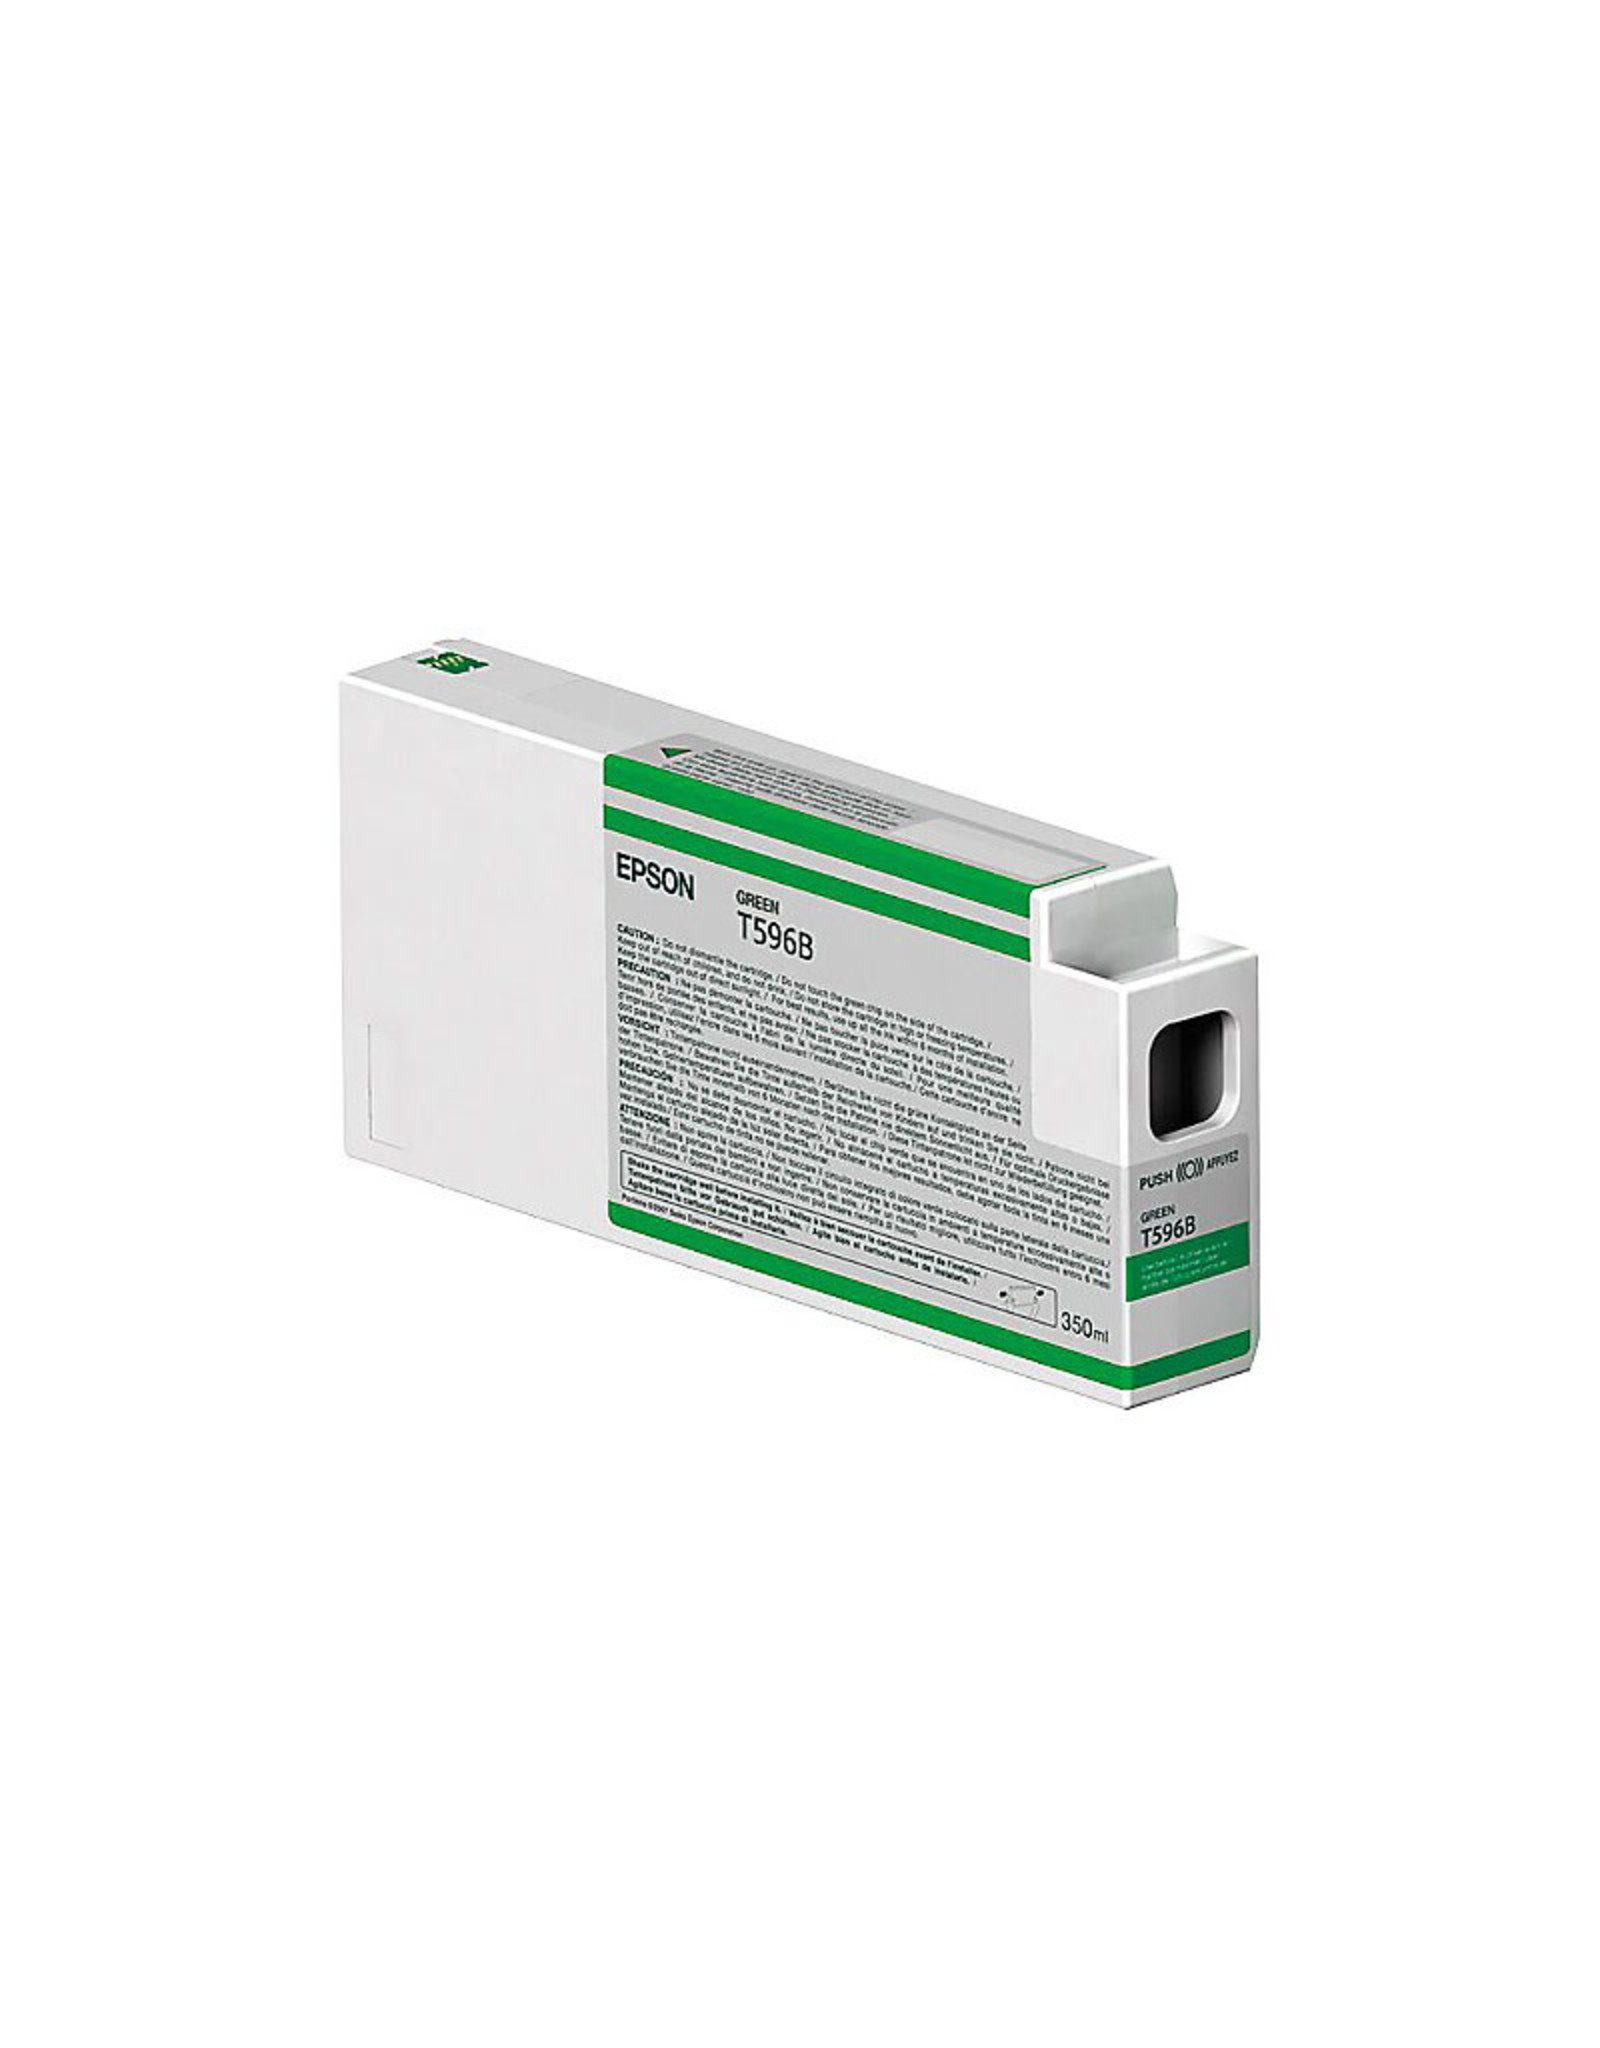 Epson Epson Green Ultrachrome HDR Ink for 9900 - 350ml cartridges